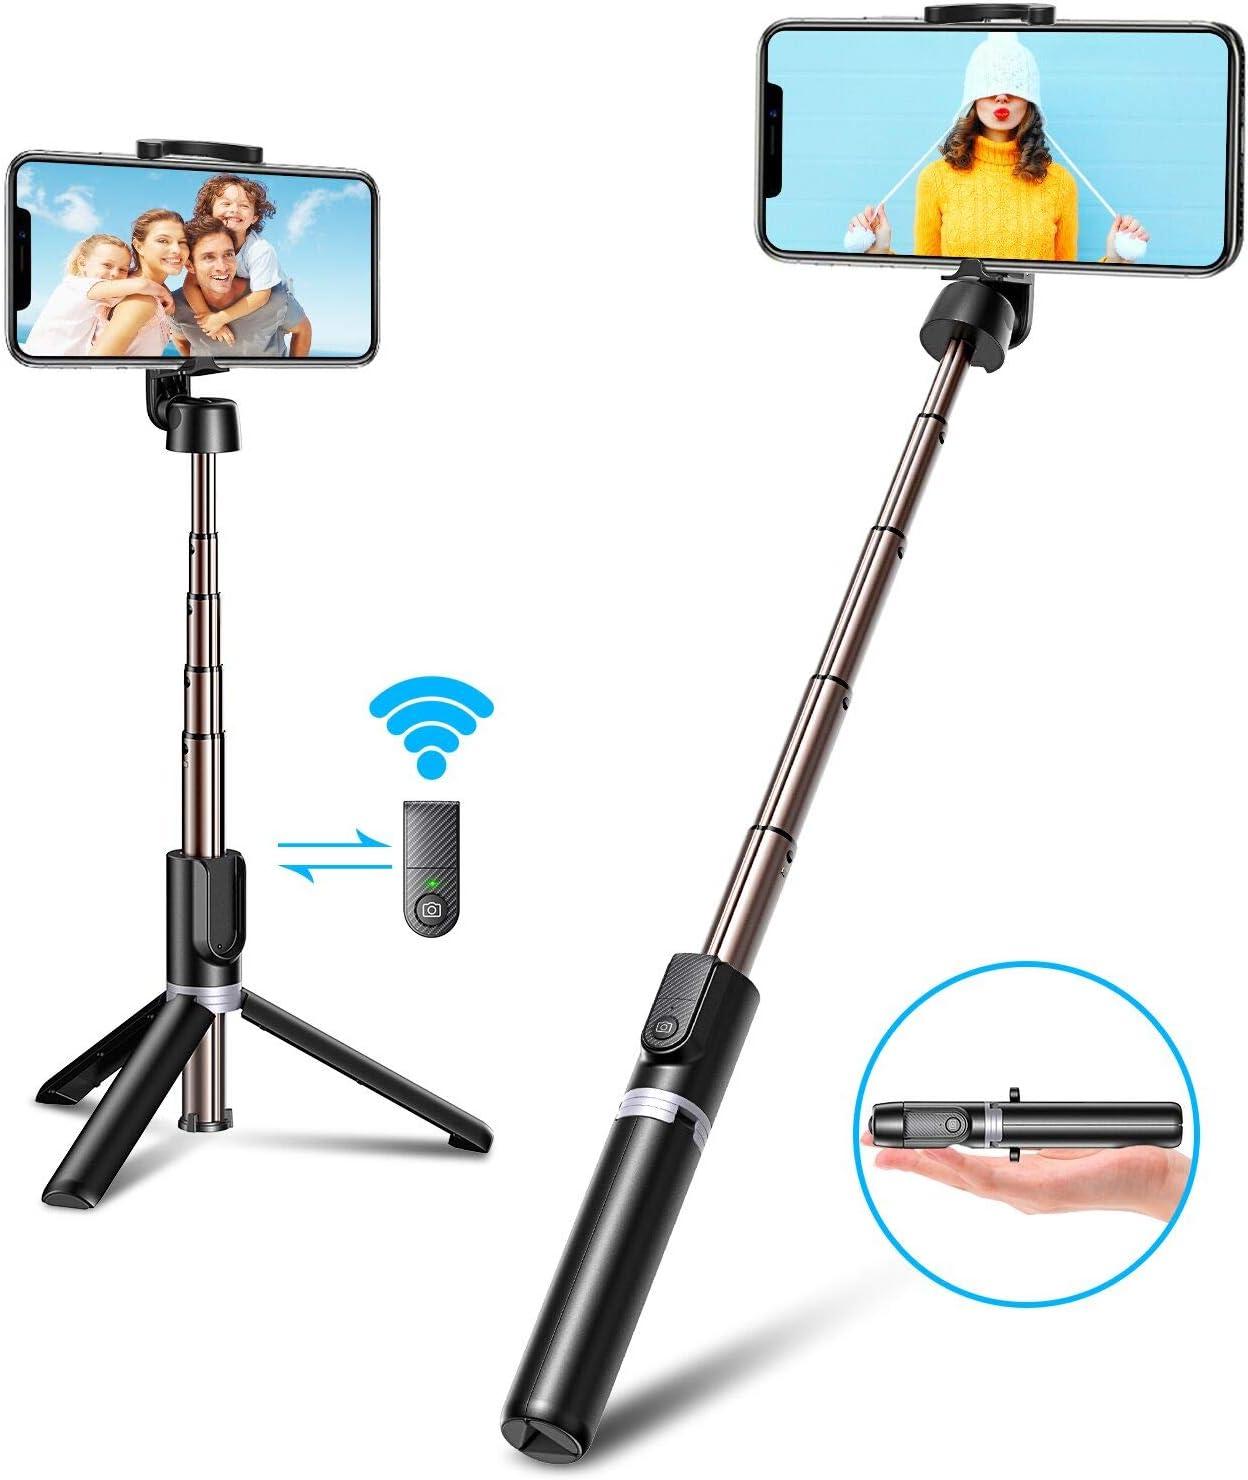 Bovon Palo Selfie Tripode, 3 en 1 Mini Tripode para Movil con Bluetooth y Control Remoto, Selfie Stick Extensible Compatible con iPhone 11Pro Max/11 Pro/XS Max/XR/8/8Plus, Galaxy S20 Plus/S10, Huawei